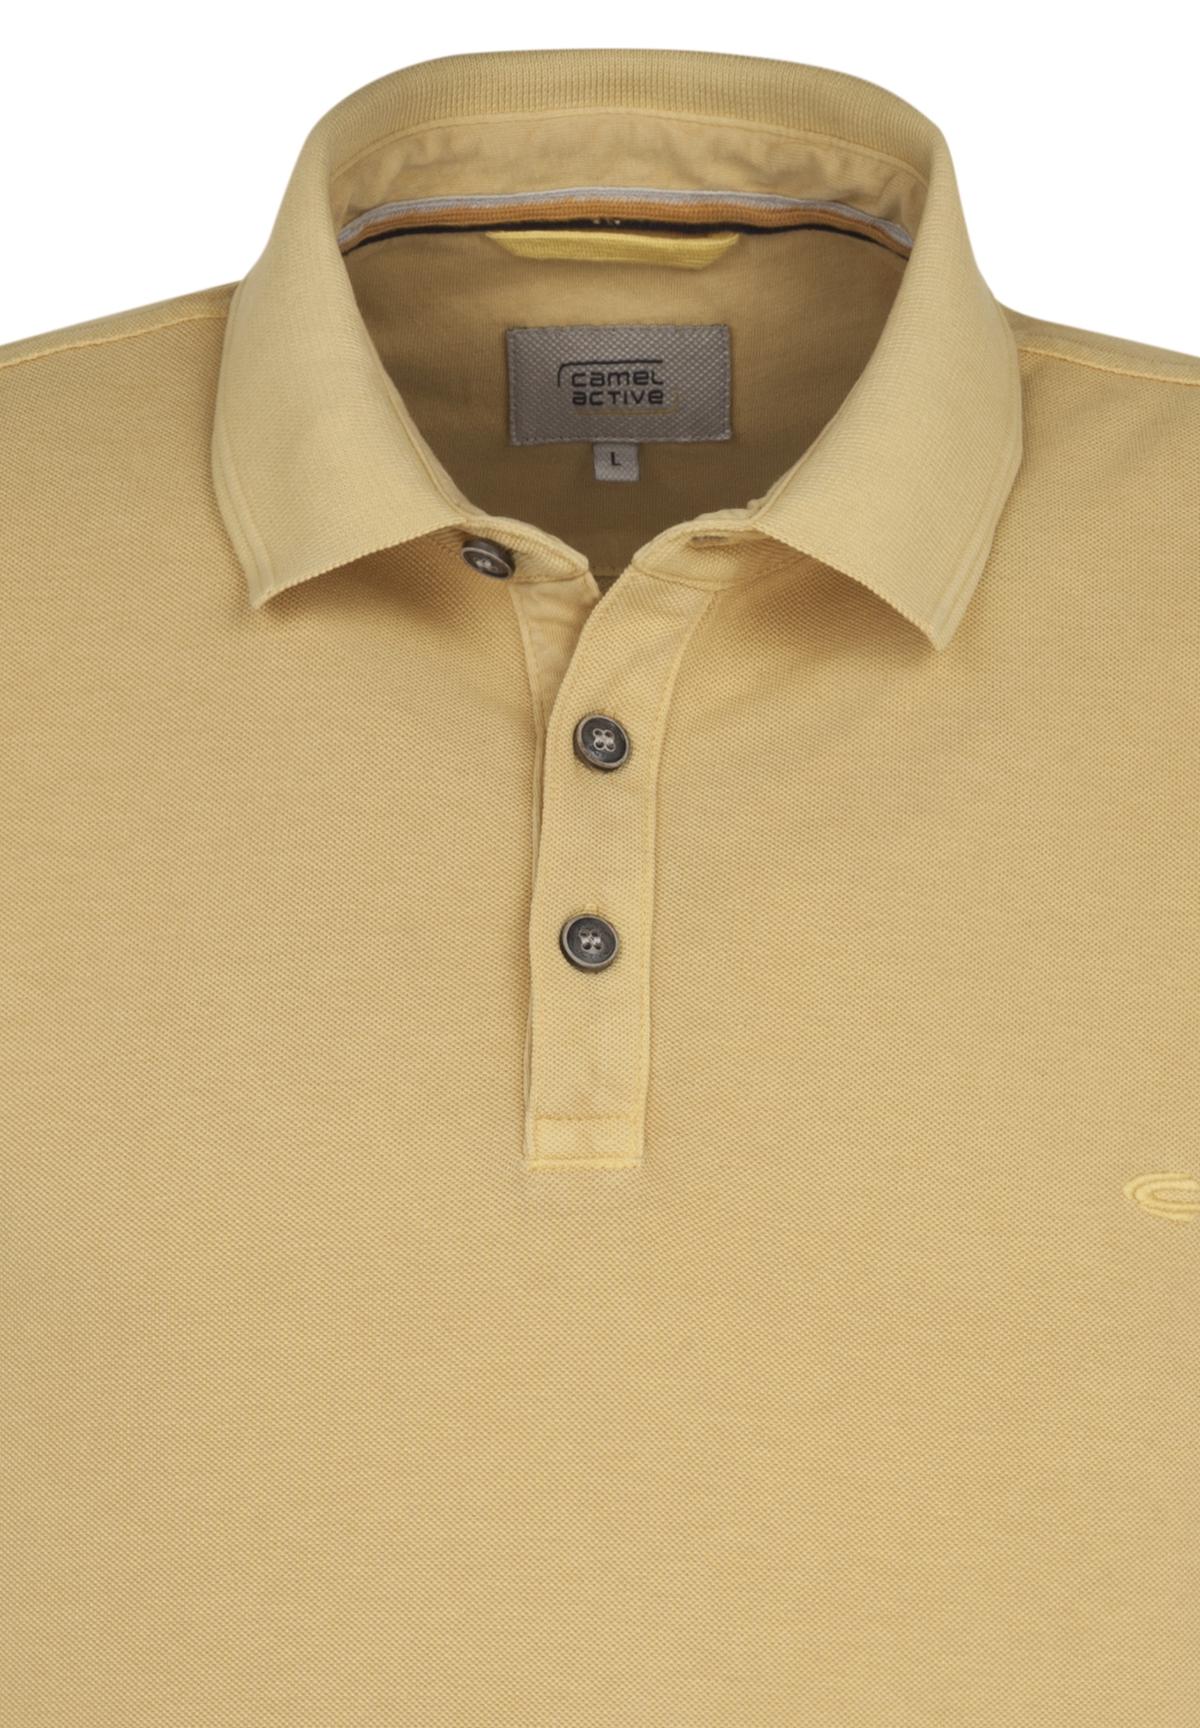 Camel-Active-Herren-Shirt-Poloshirt-Pique-Regular-Fit-NEU Indexbild 75